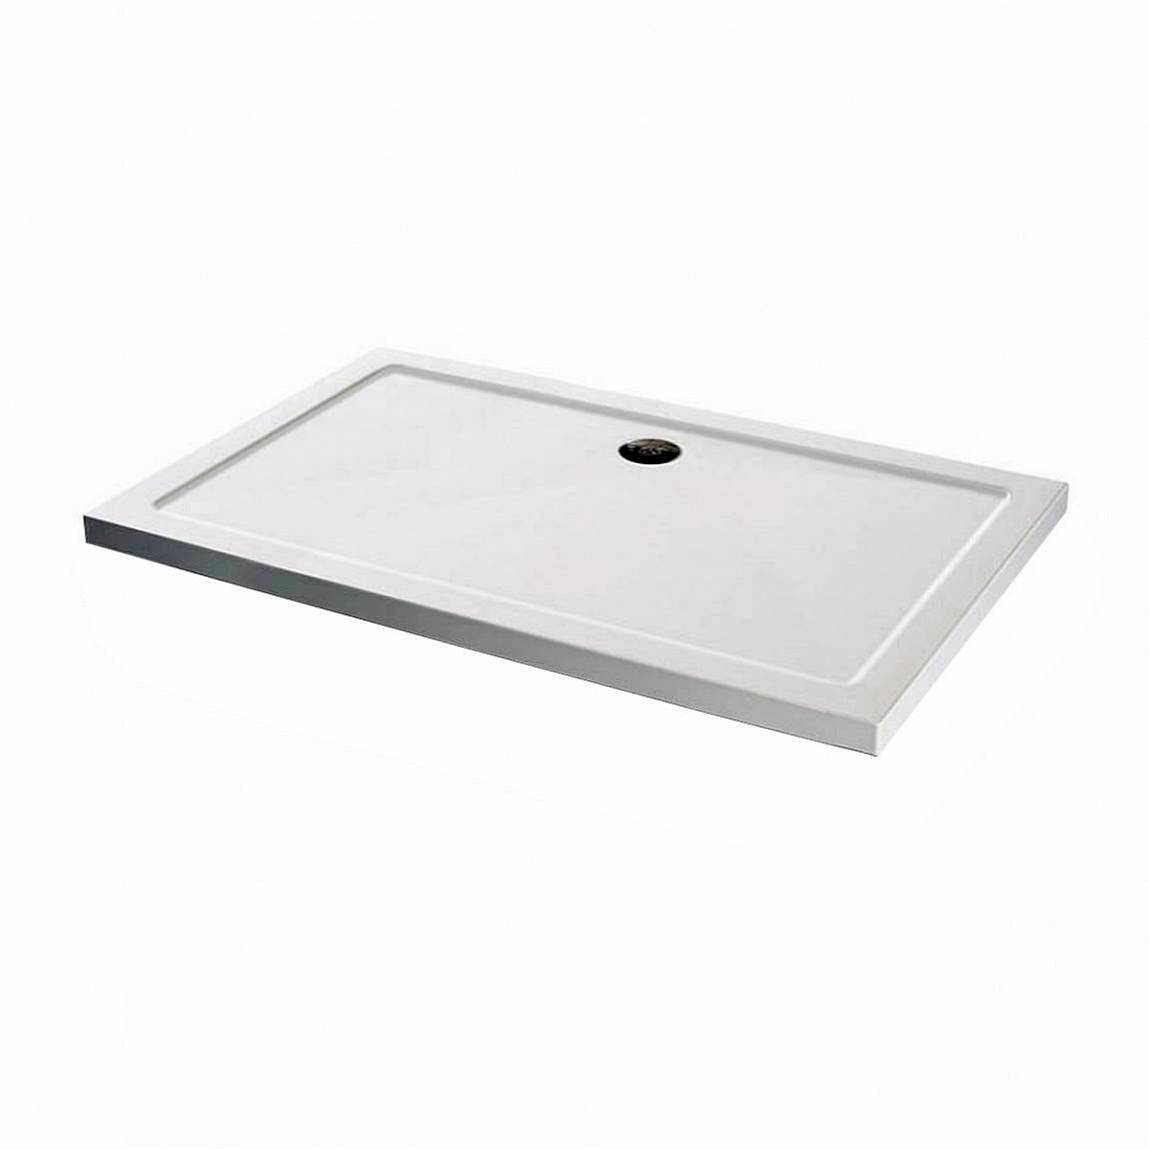 Image of Rectangular Stone Shower Tray 1200 x 800